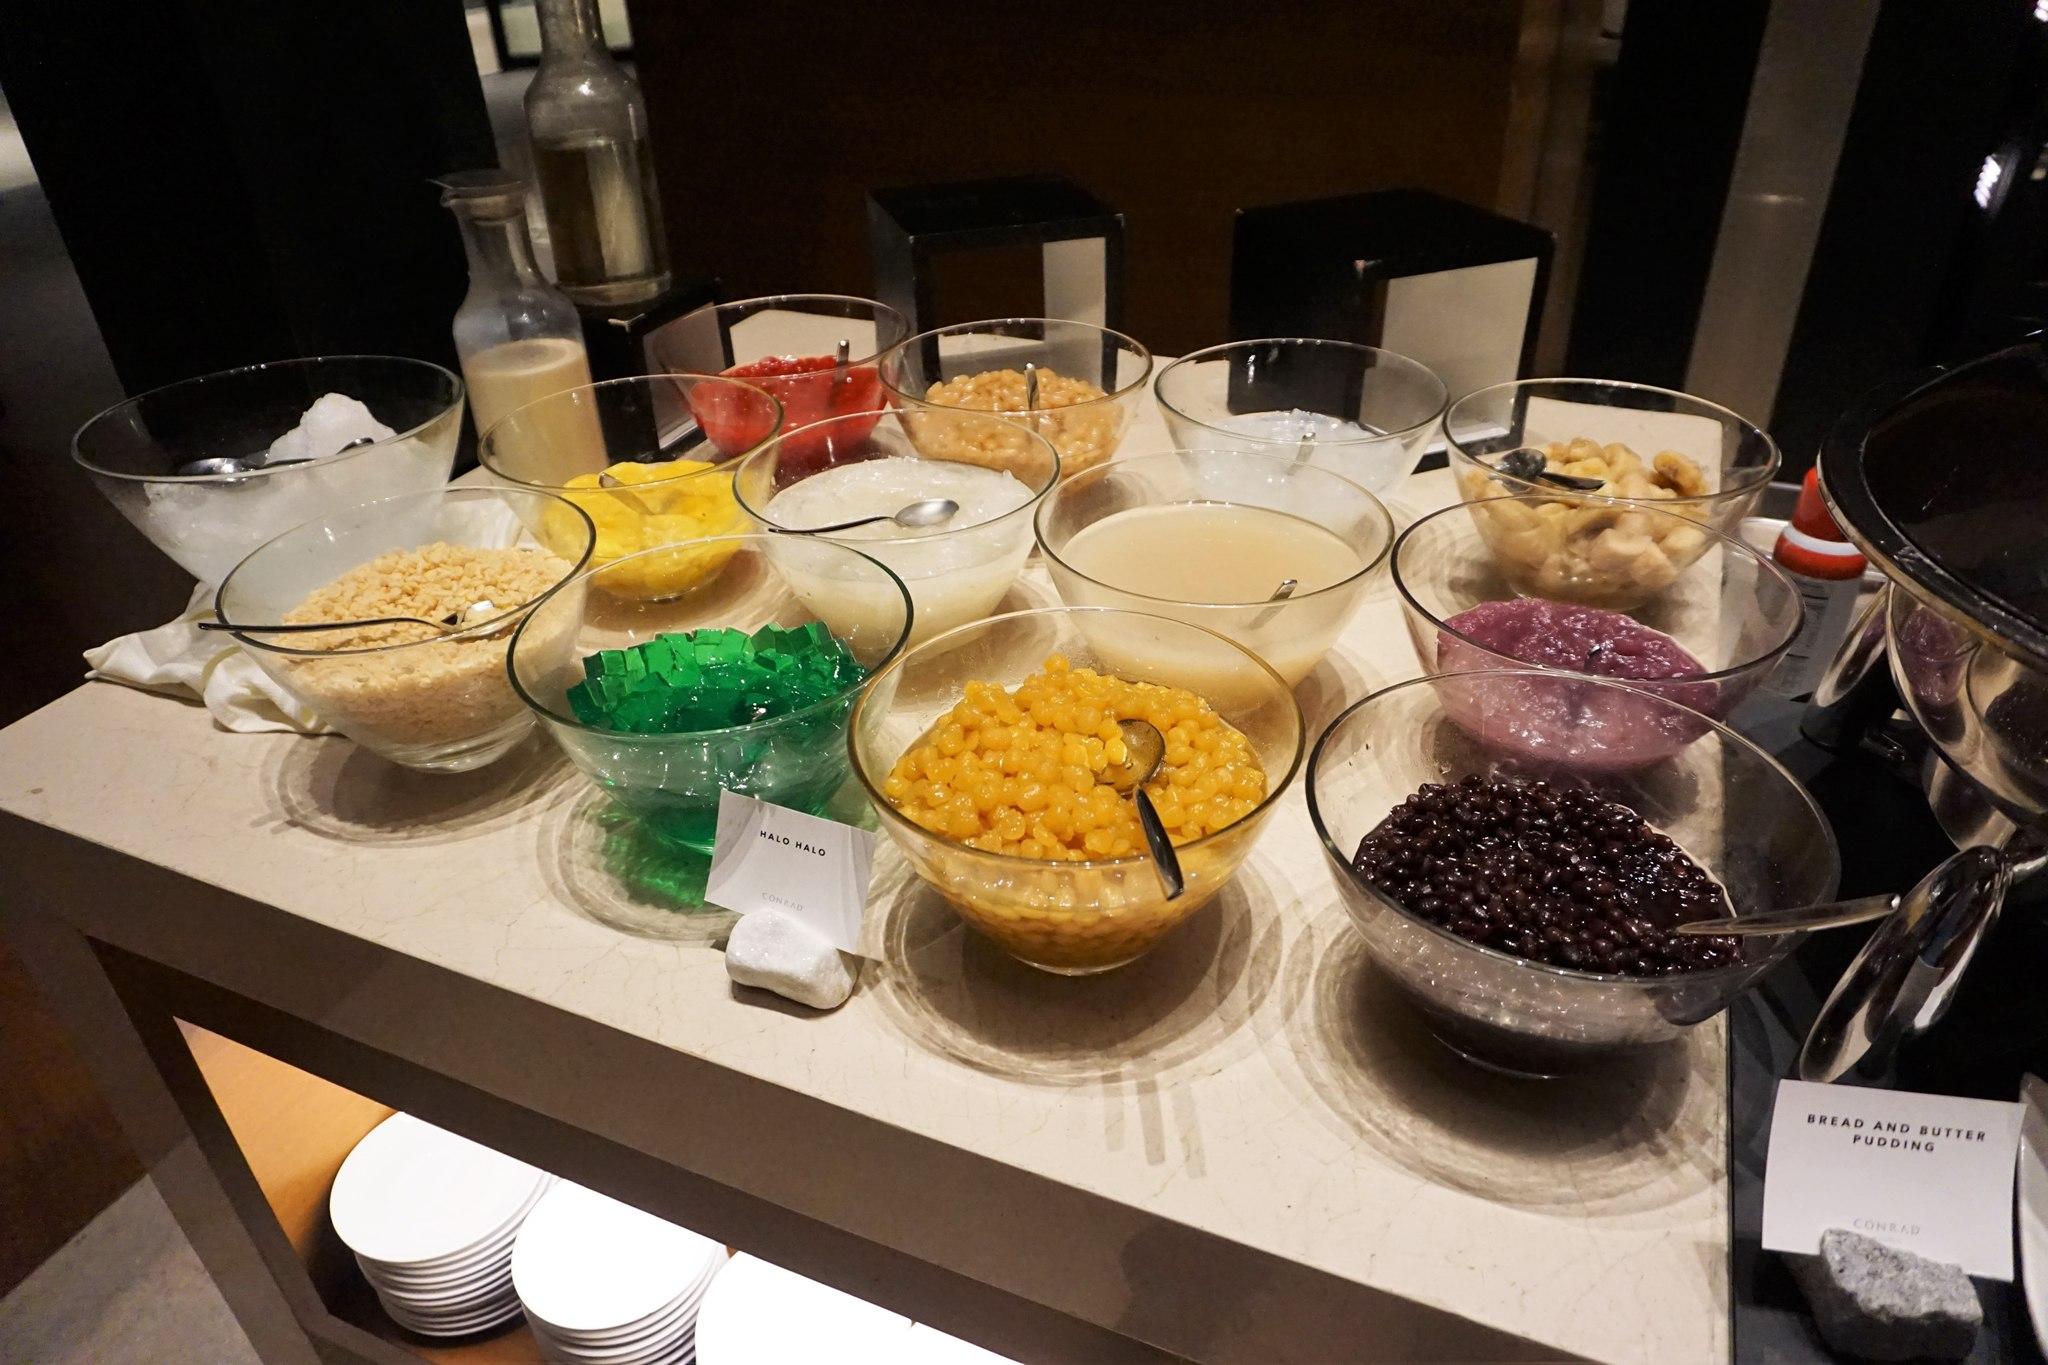 desserts-at-conrad-manila-brasserie-on-3-4